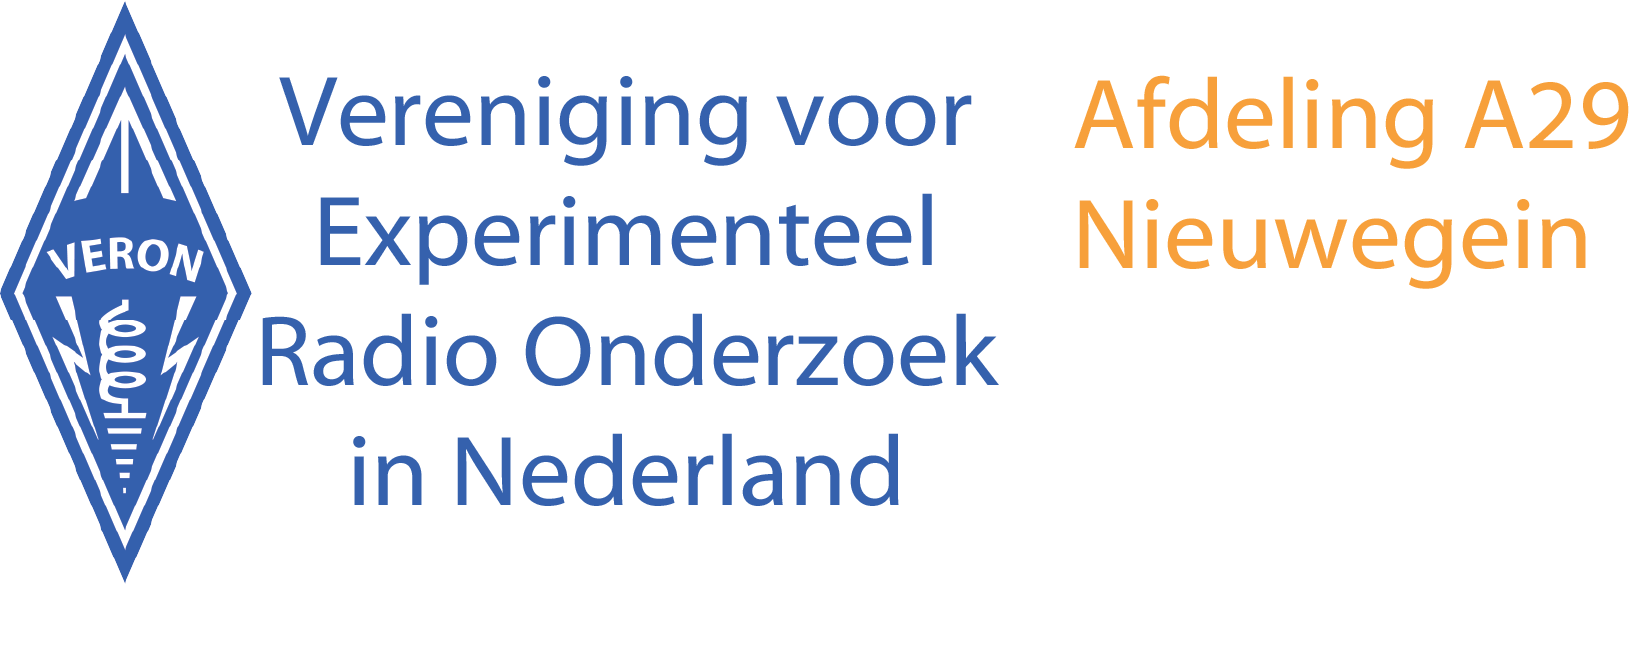 VERON a29 - Nieuwegein